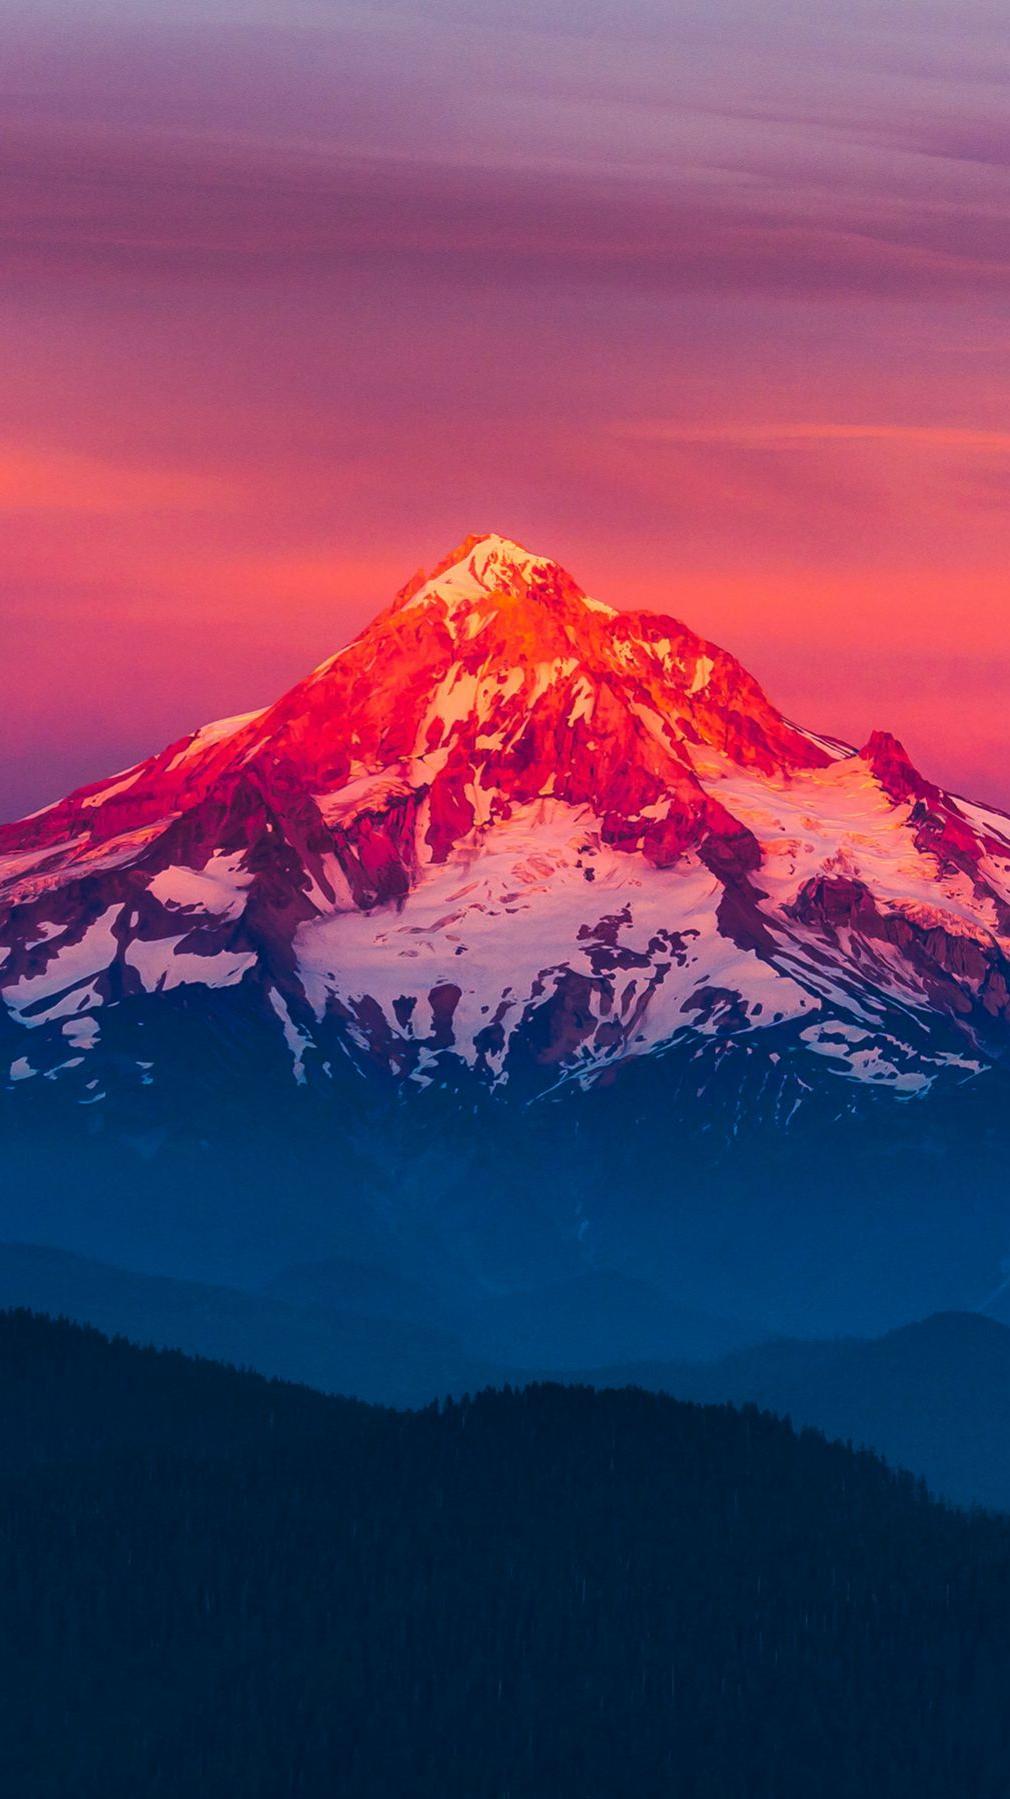 Red Mountain Sunrise Wallpaper iPhone Wallpaper iphoneswallpapers com